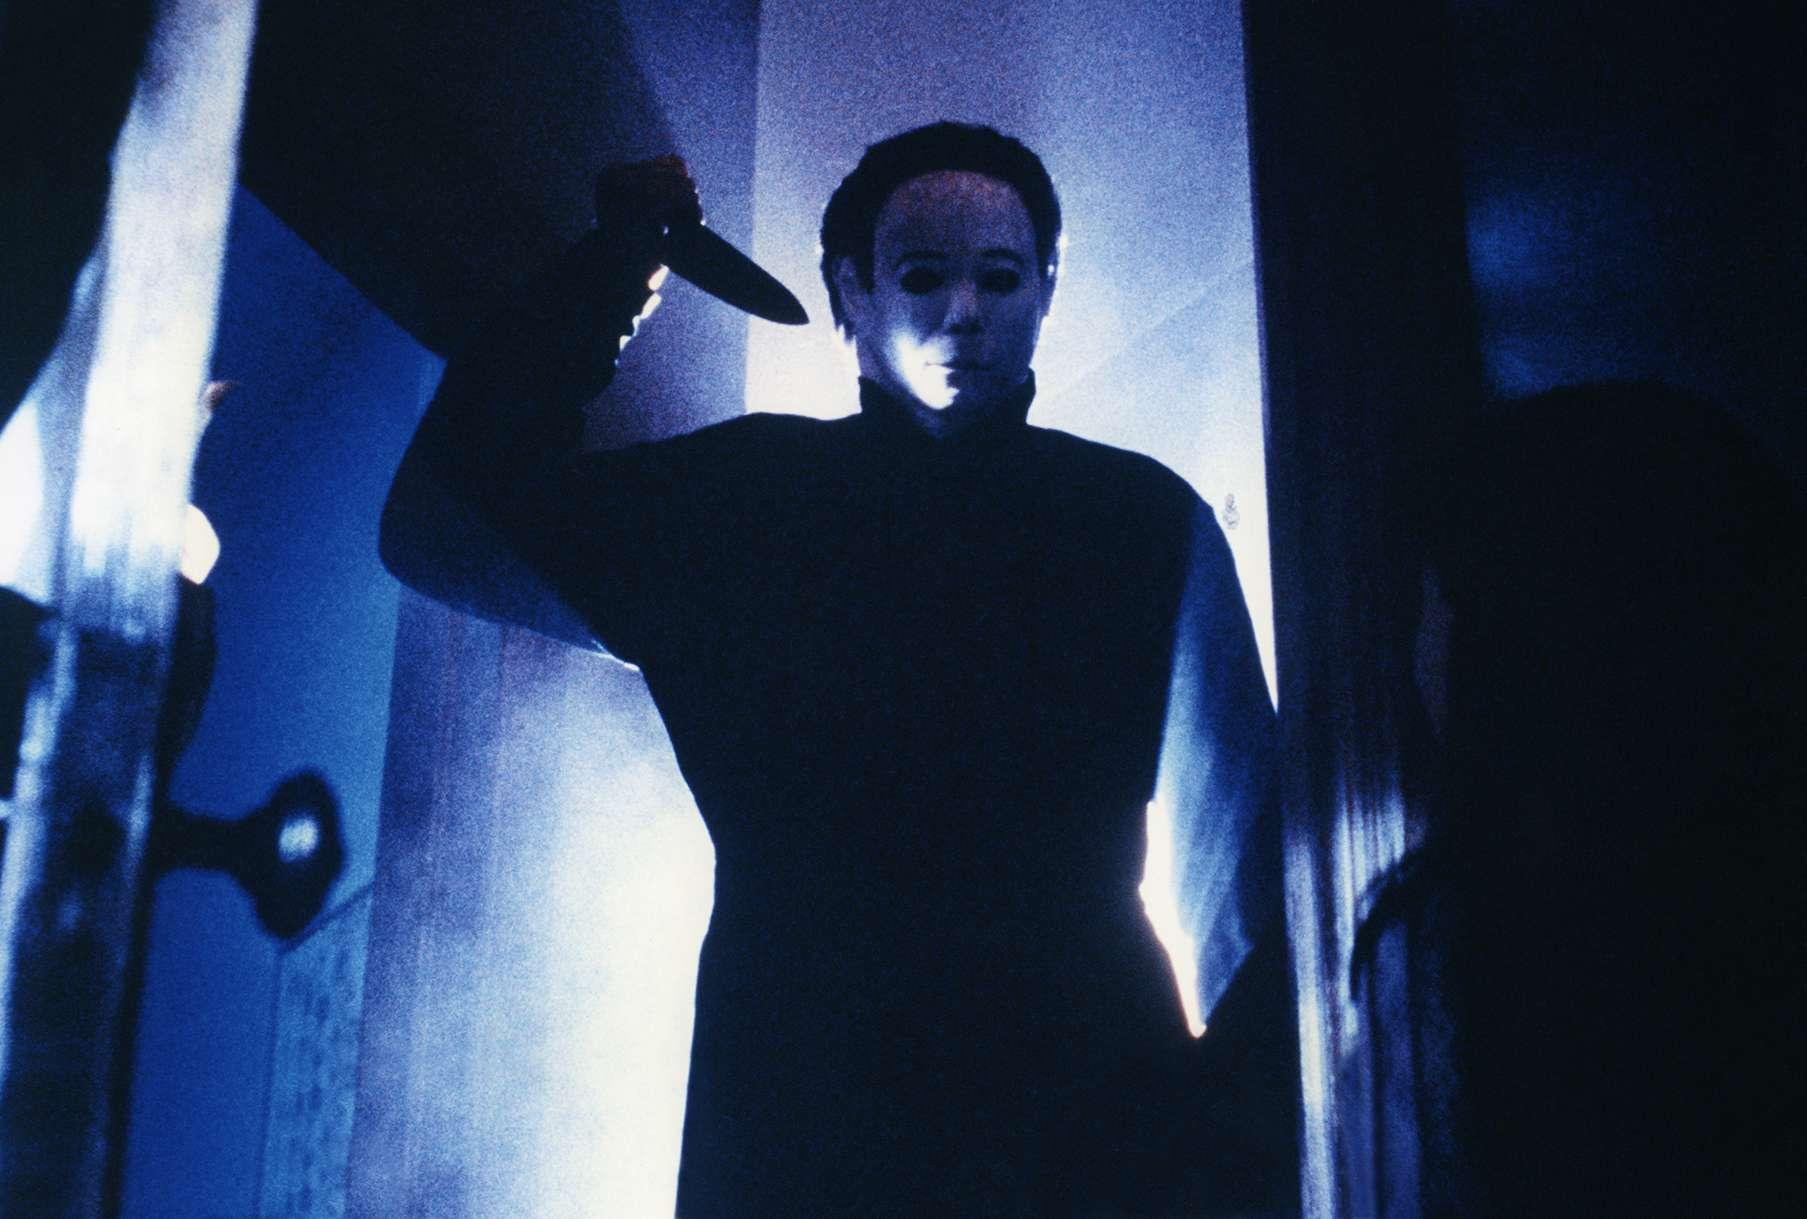 Actor Tony Moran on the set of Halloween